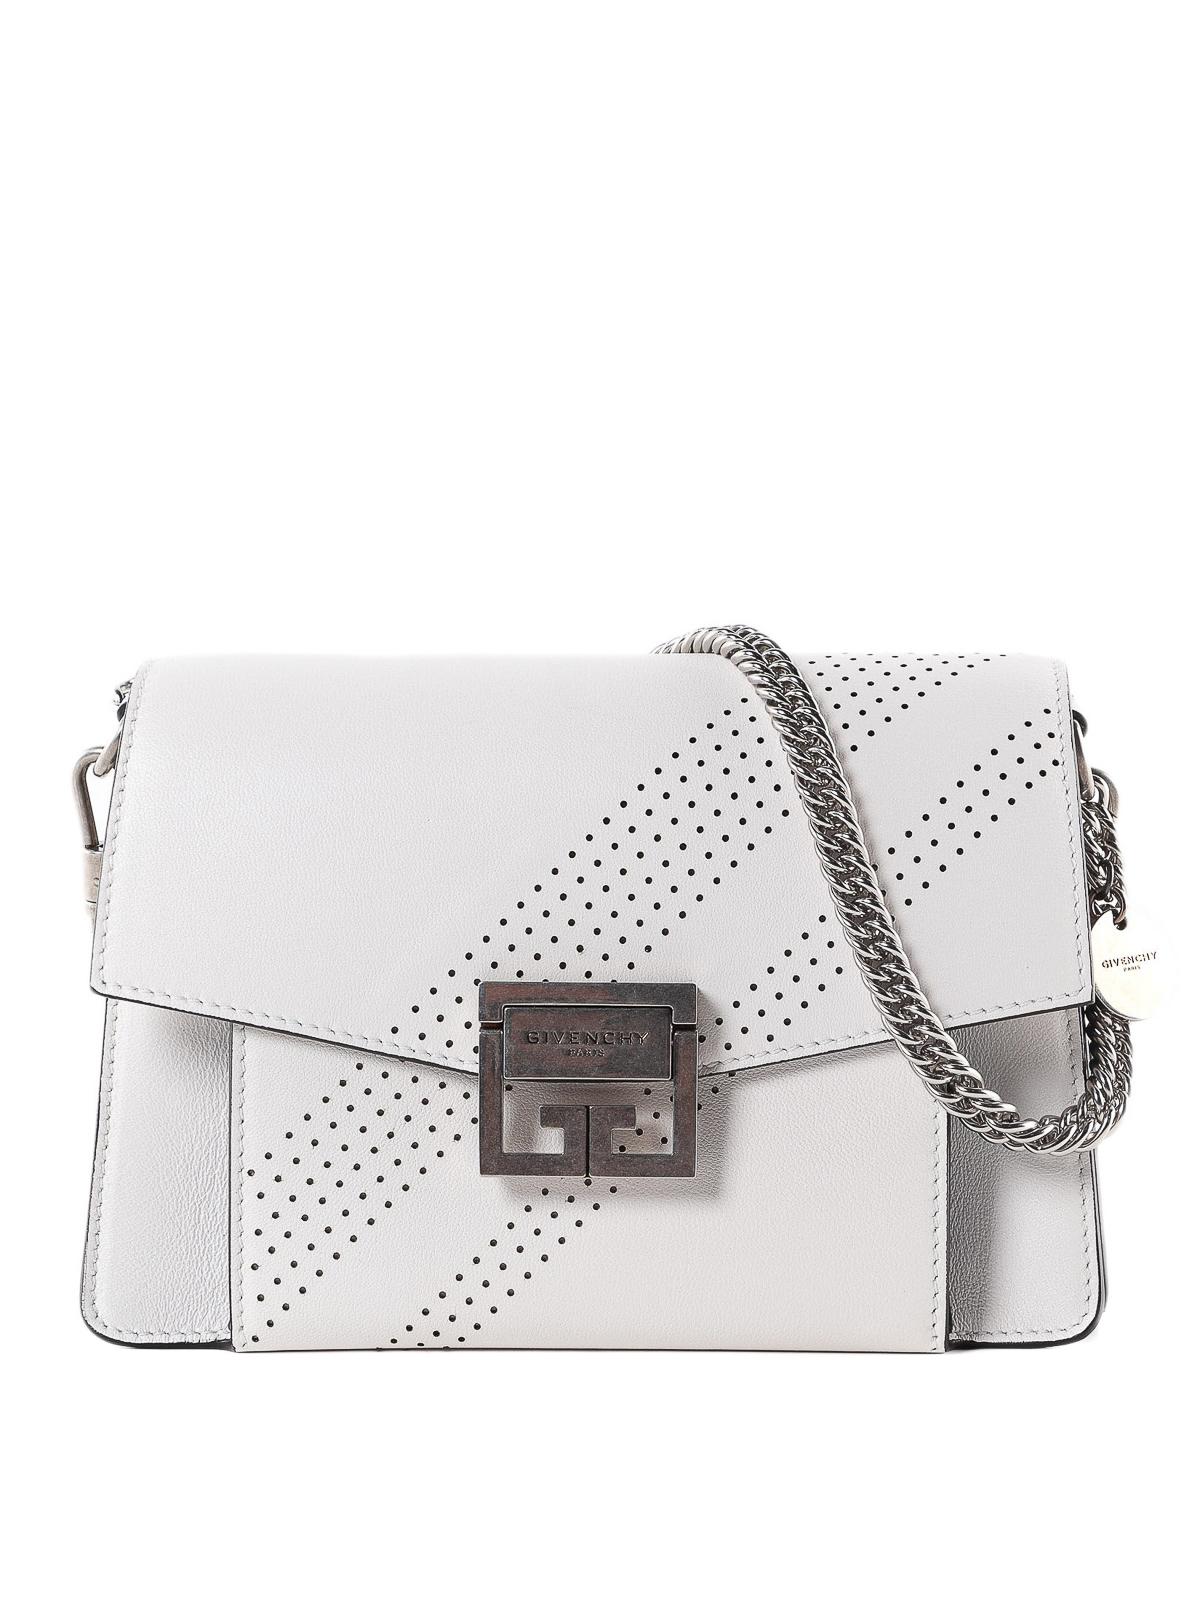 926437ce22605 Givenchy - GV3 small bag - cross body bags - BB501CB0CM 100